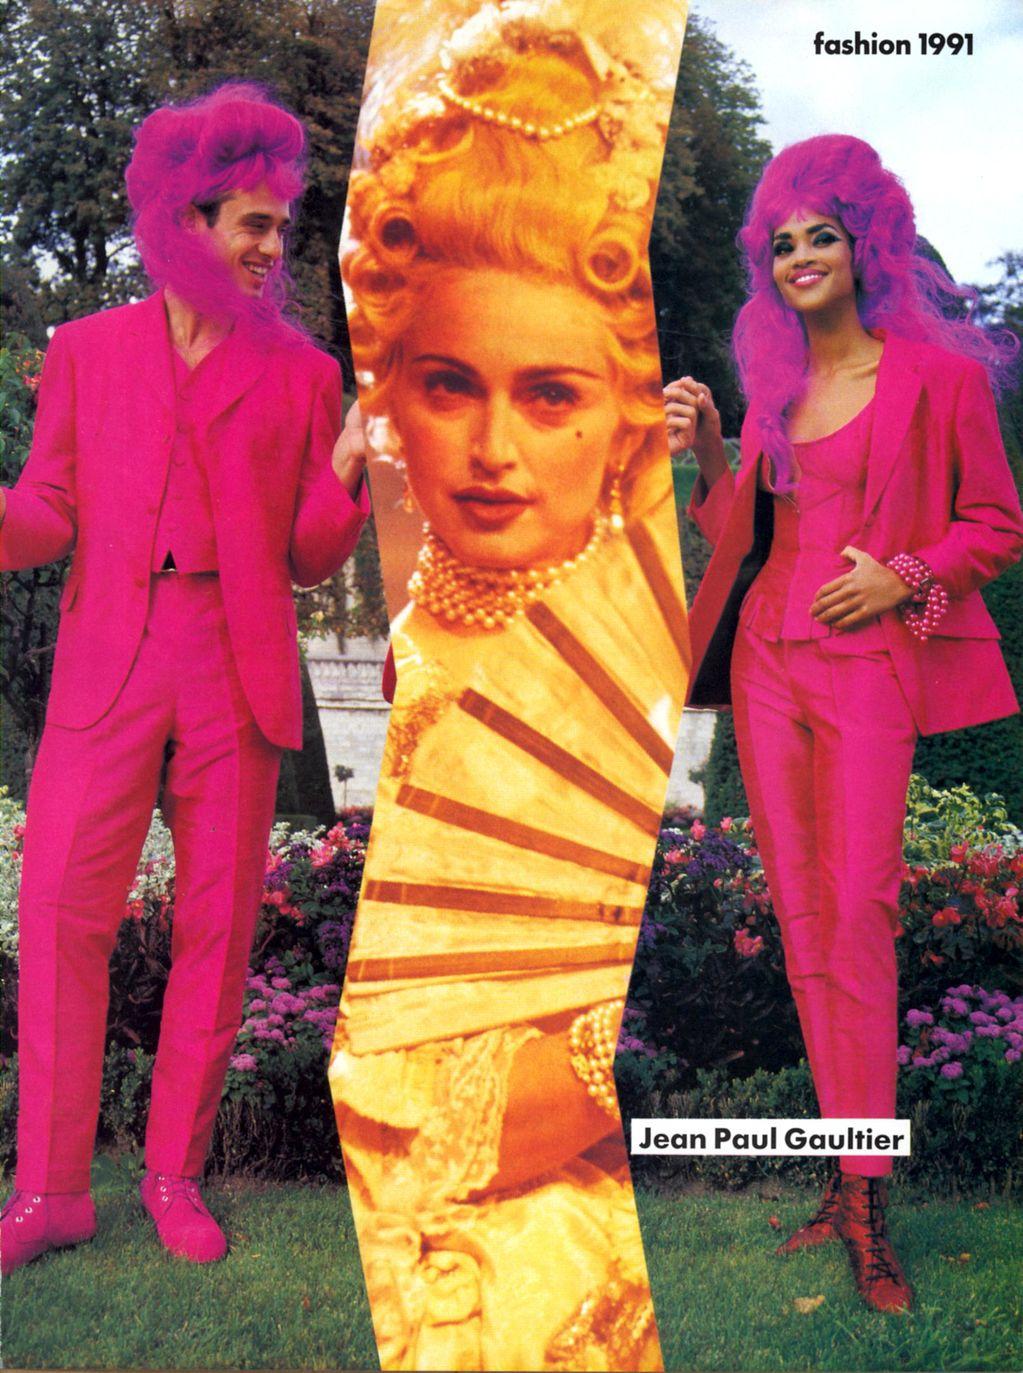 Vogue (US) January 1991 | Fashion 1991 16.jpg